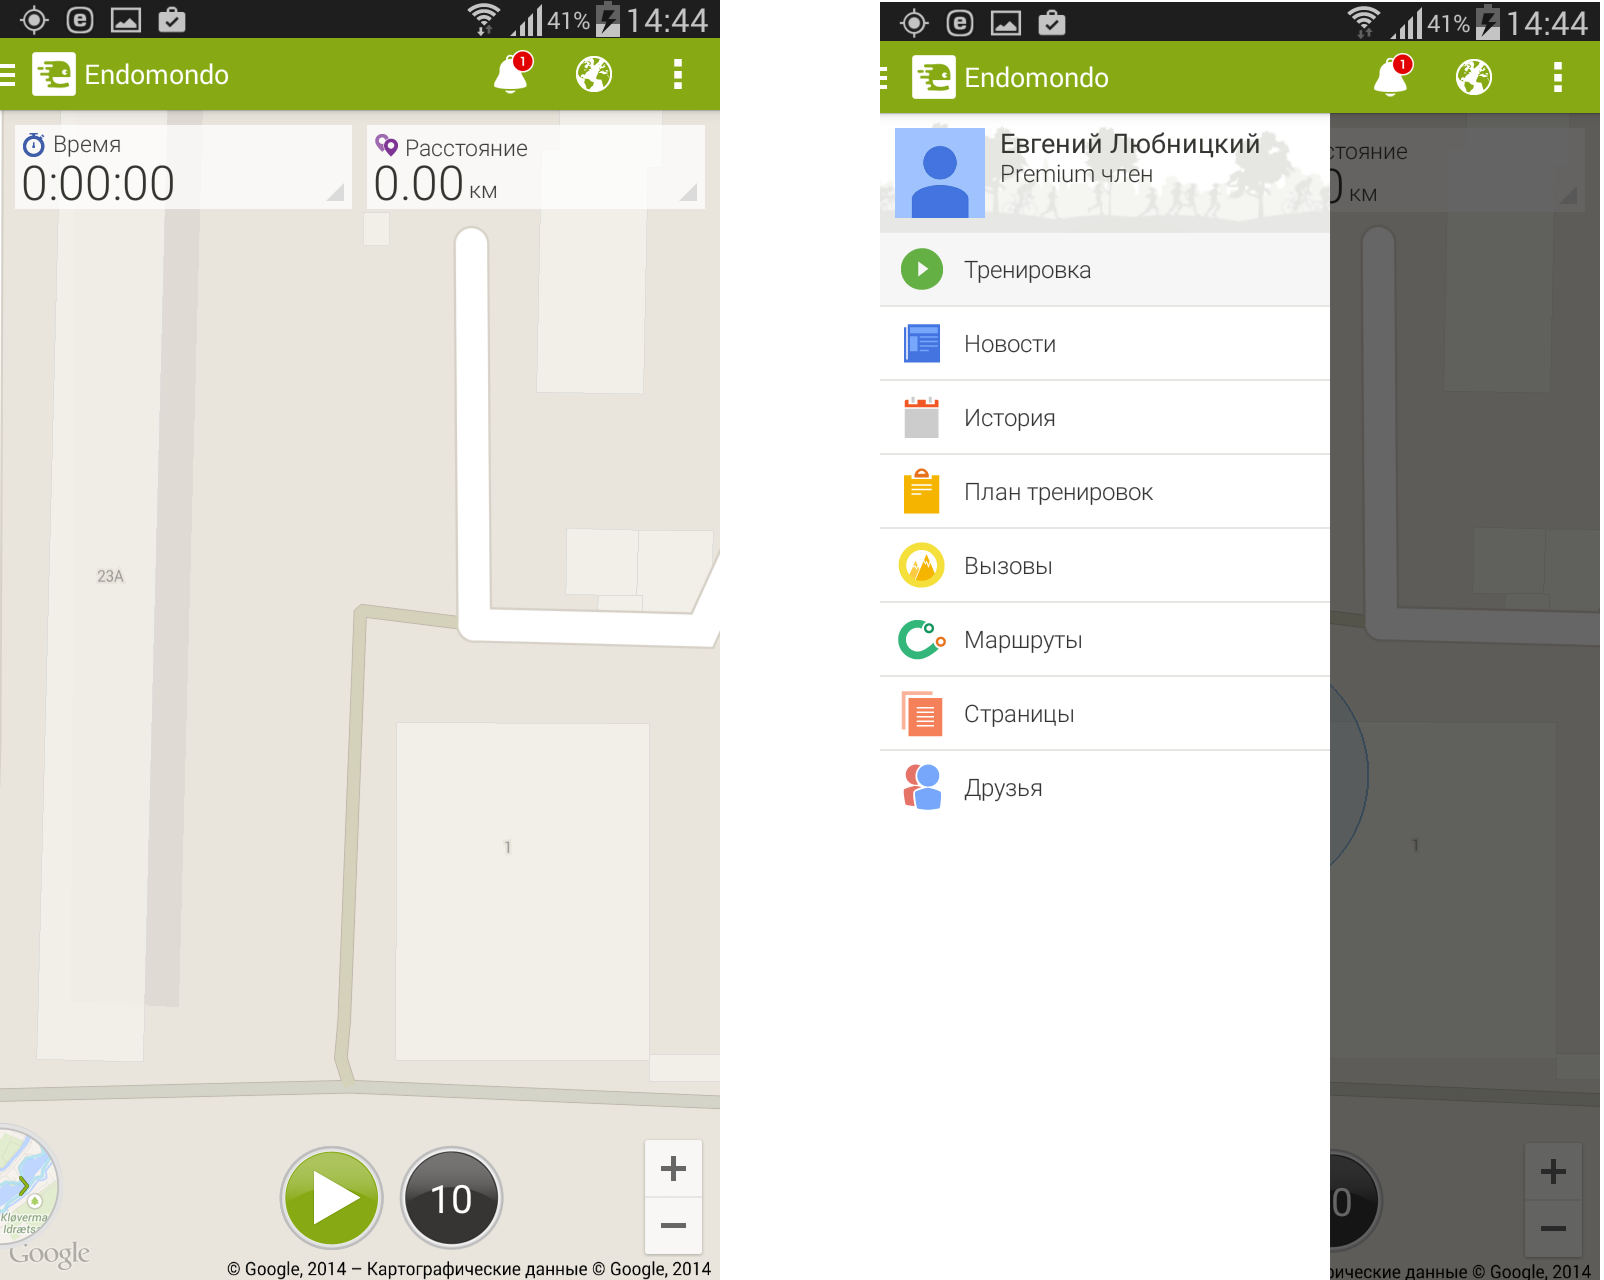 ТОП-20 приложений для Android - Endomondo